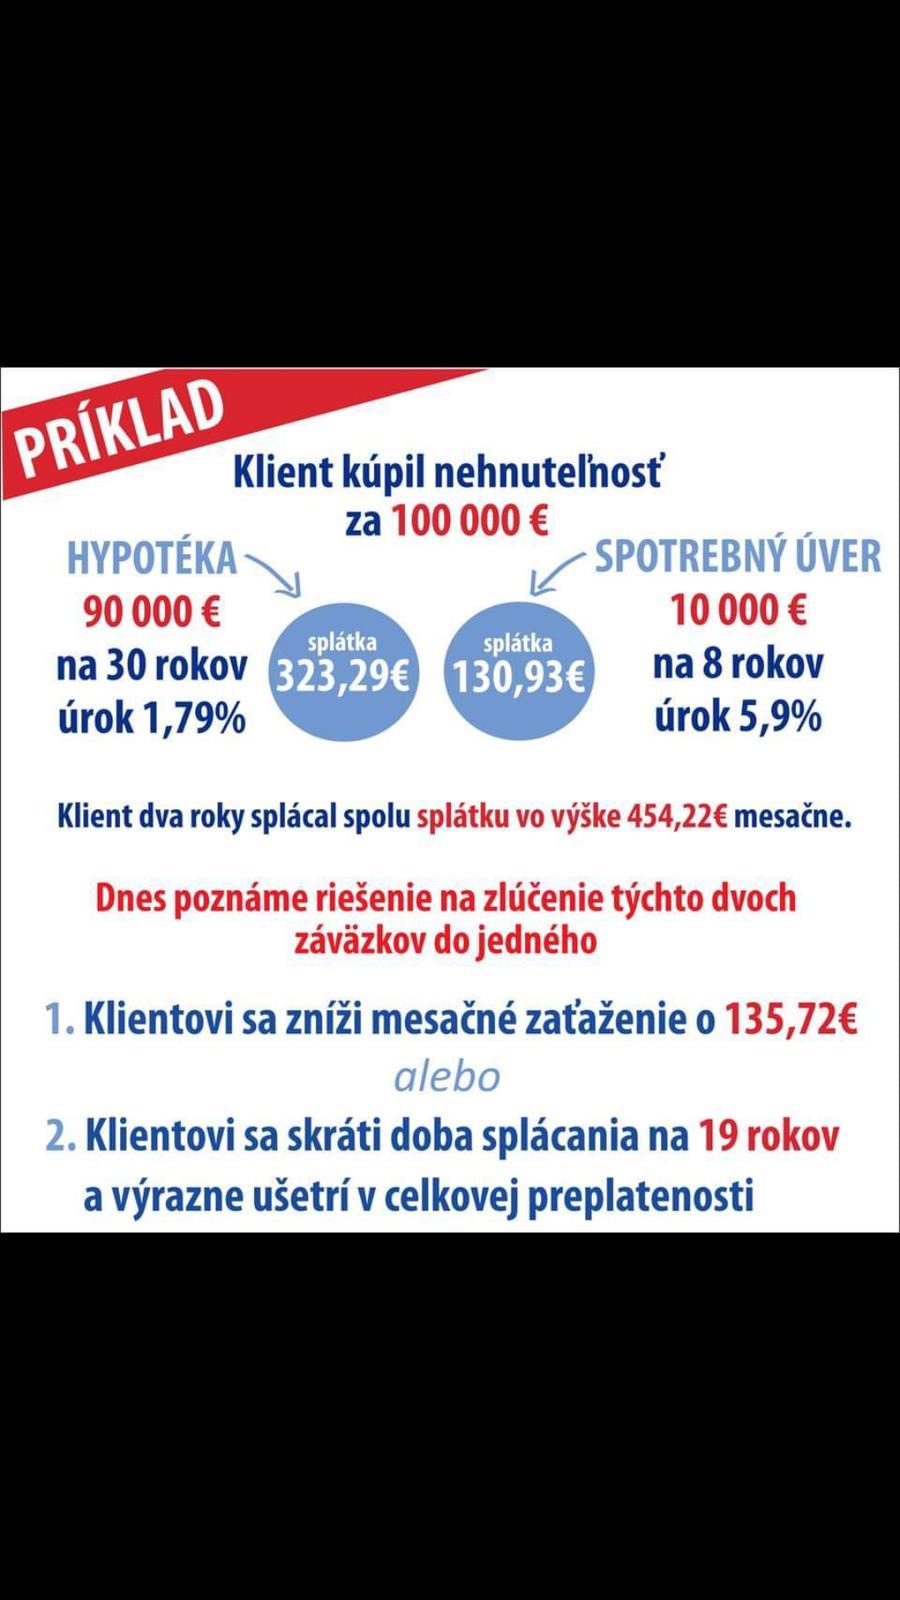 katka_turinicova - Aj takto Vam viem pomoct usetrit :)